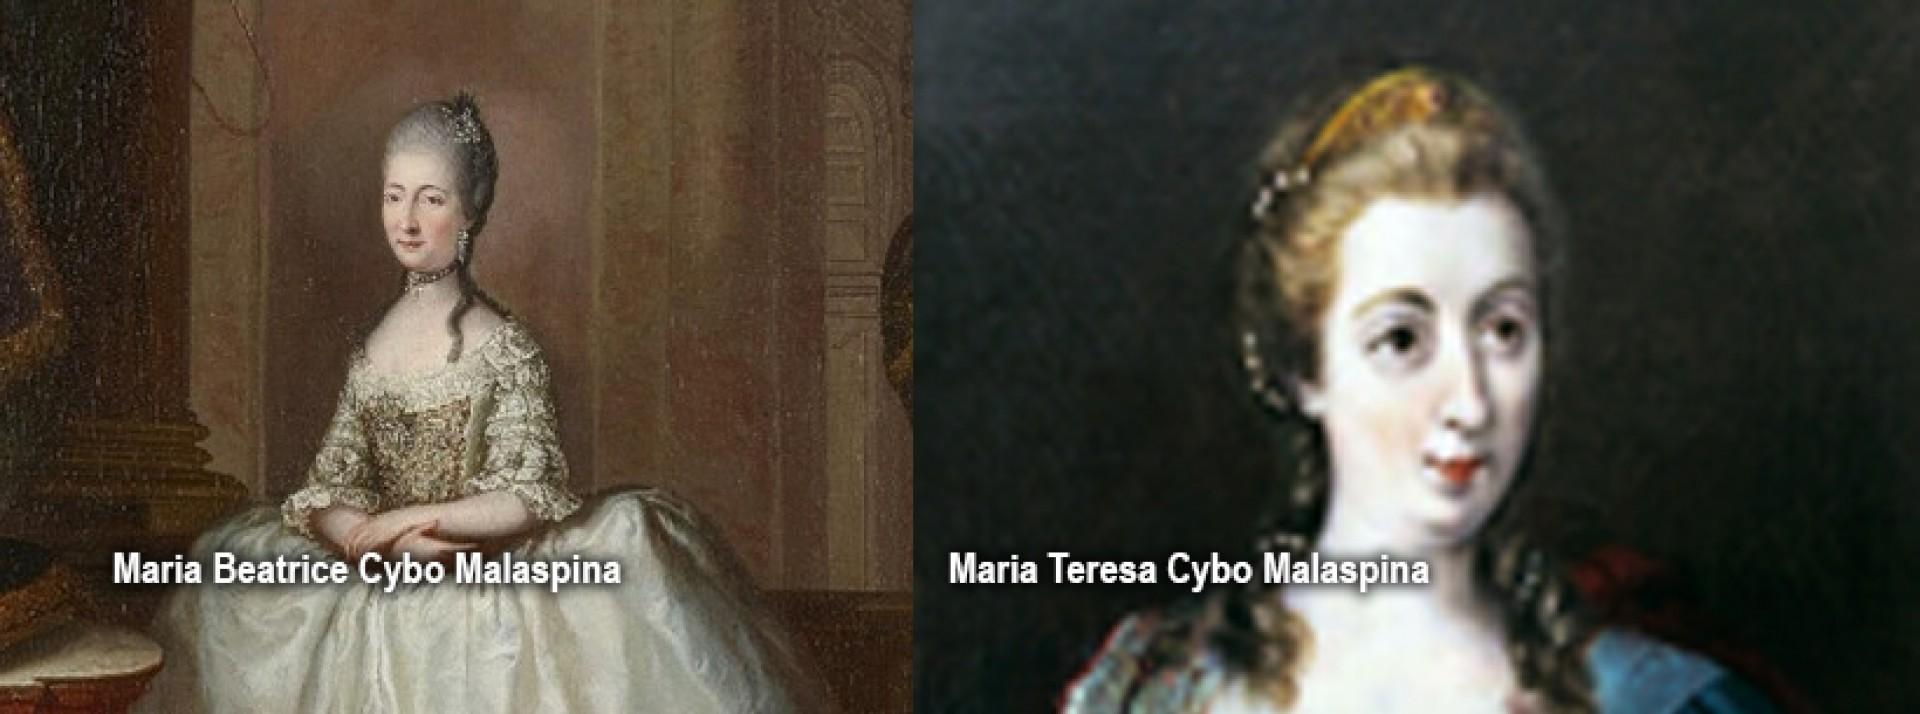 Maria Teresa e Maria Beatrice Malaspina: Duchesse di Massa, Modena e Reggio Emilia, Principesse di Carrara